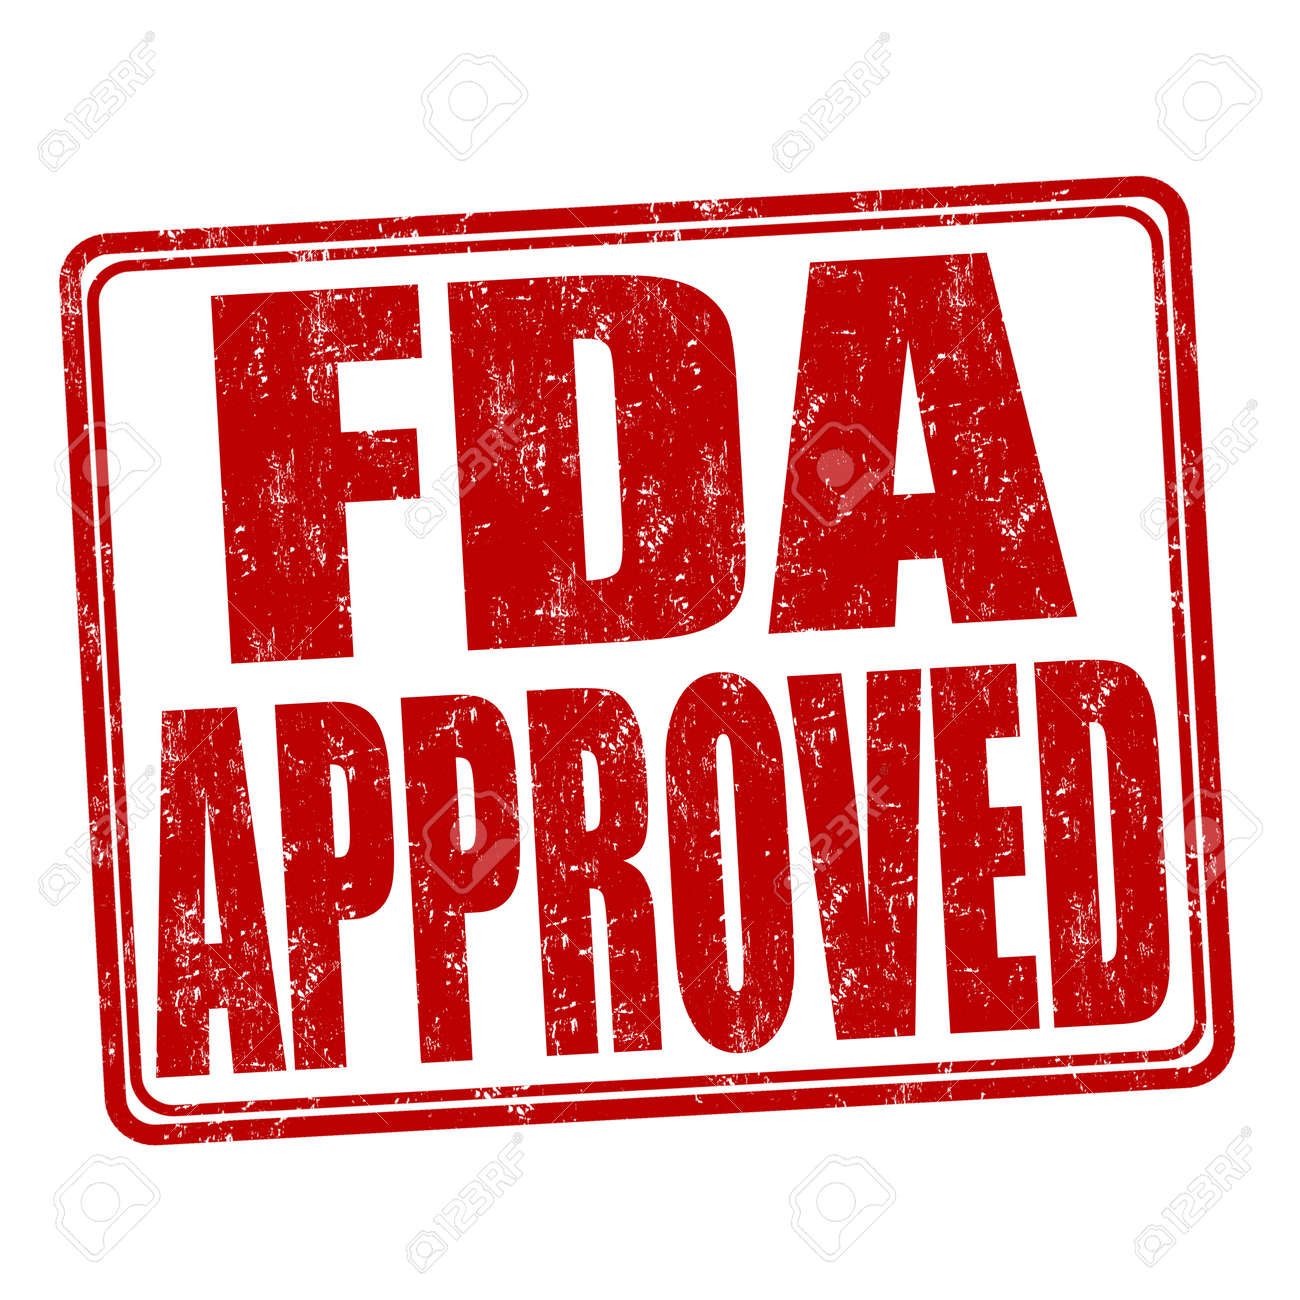 FDA approved grunge rubber stamp on white background, vector illustration - 46476646